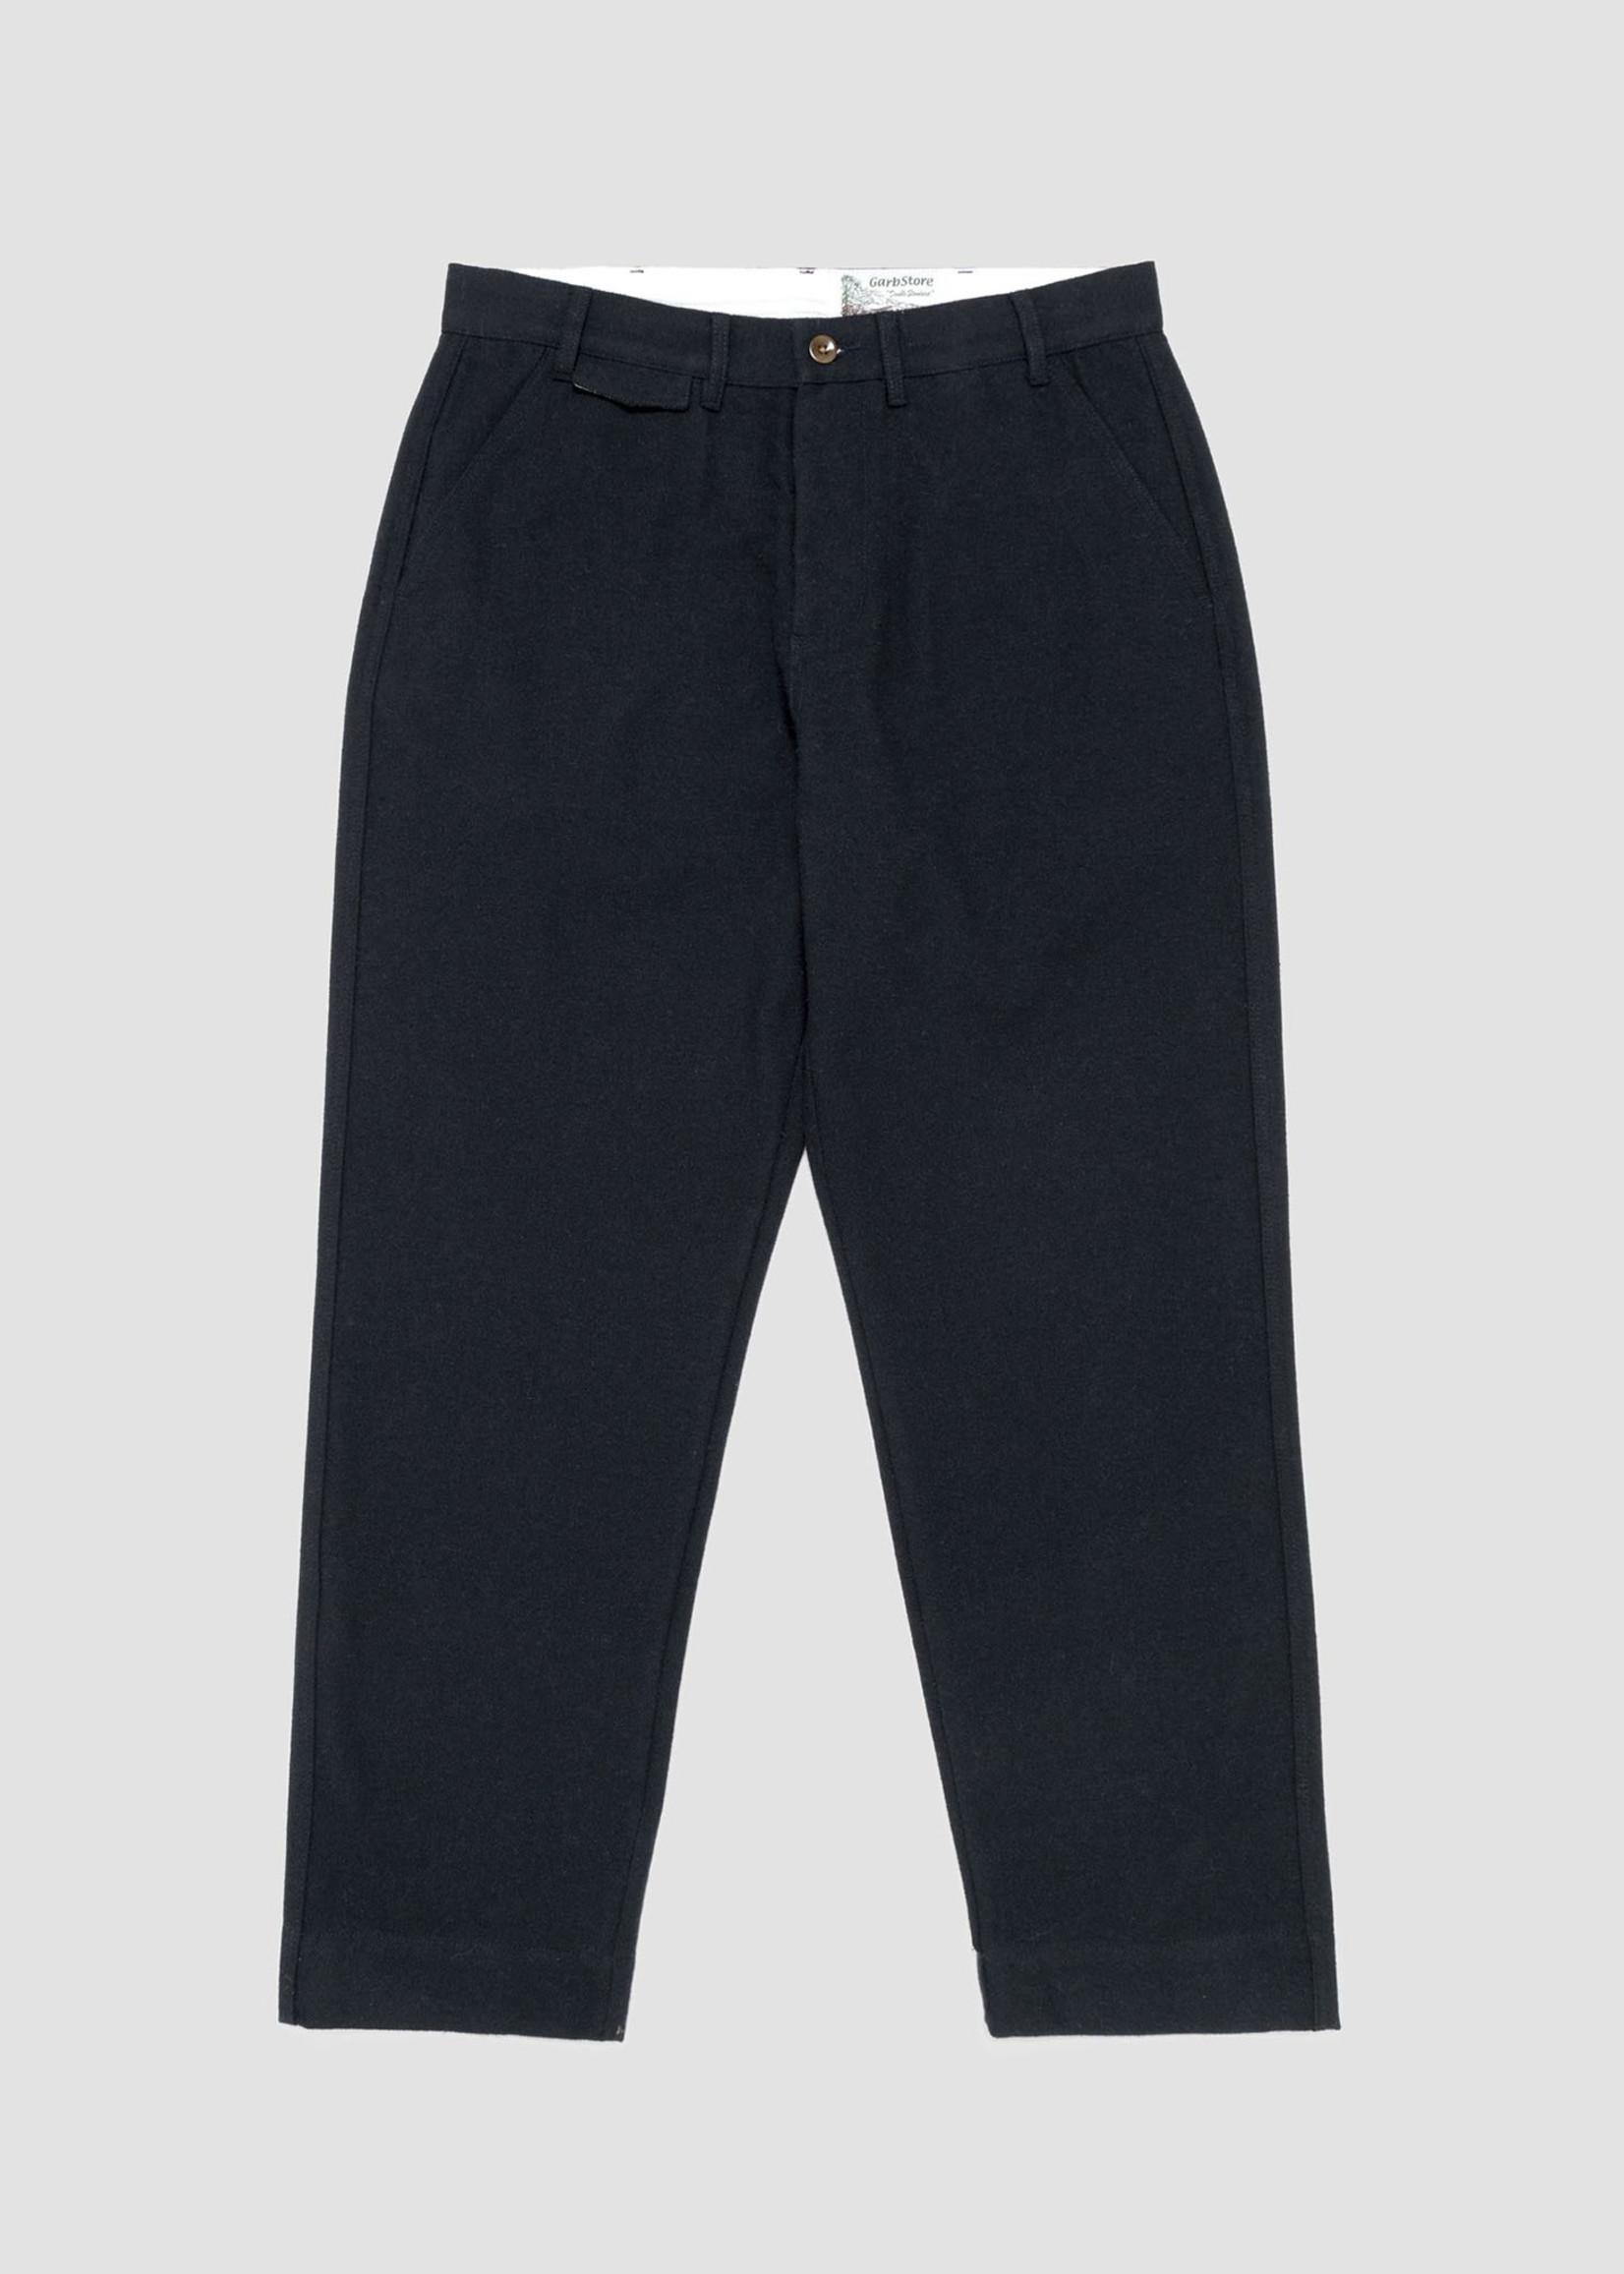 GarbStore Garbstore Work Chino Navy Cotton/Wool Herringbone